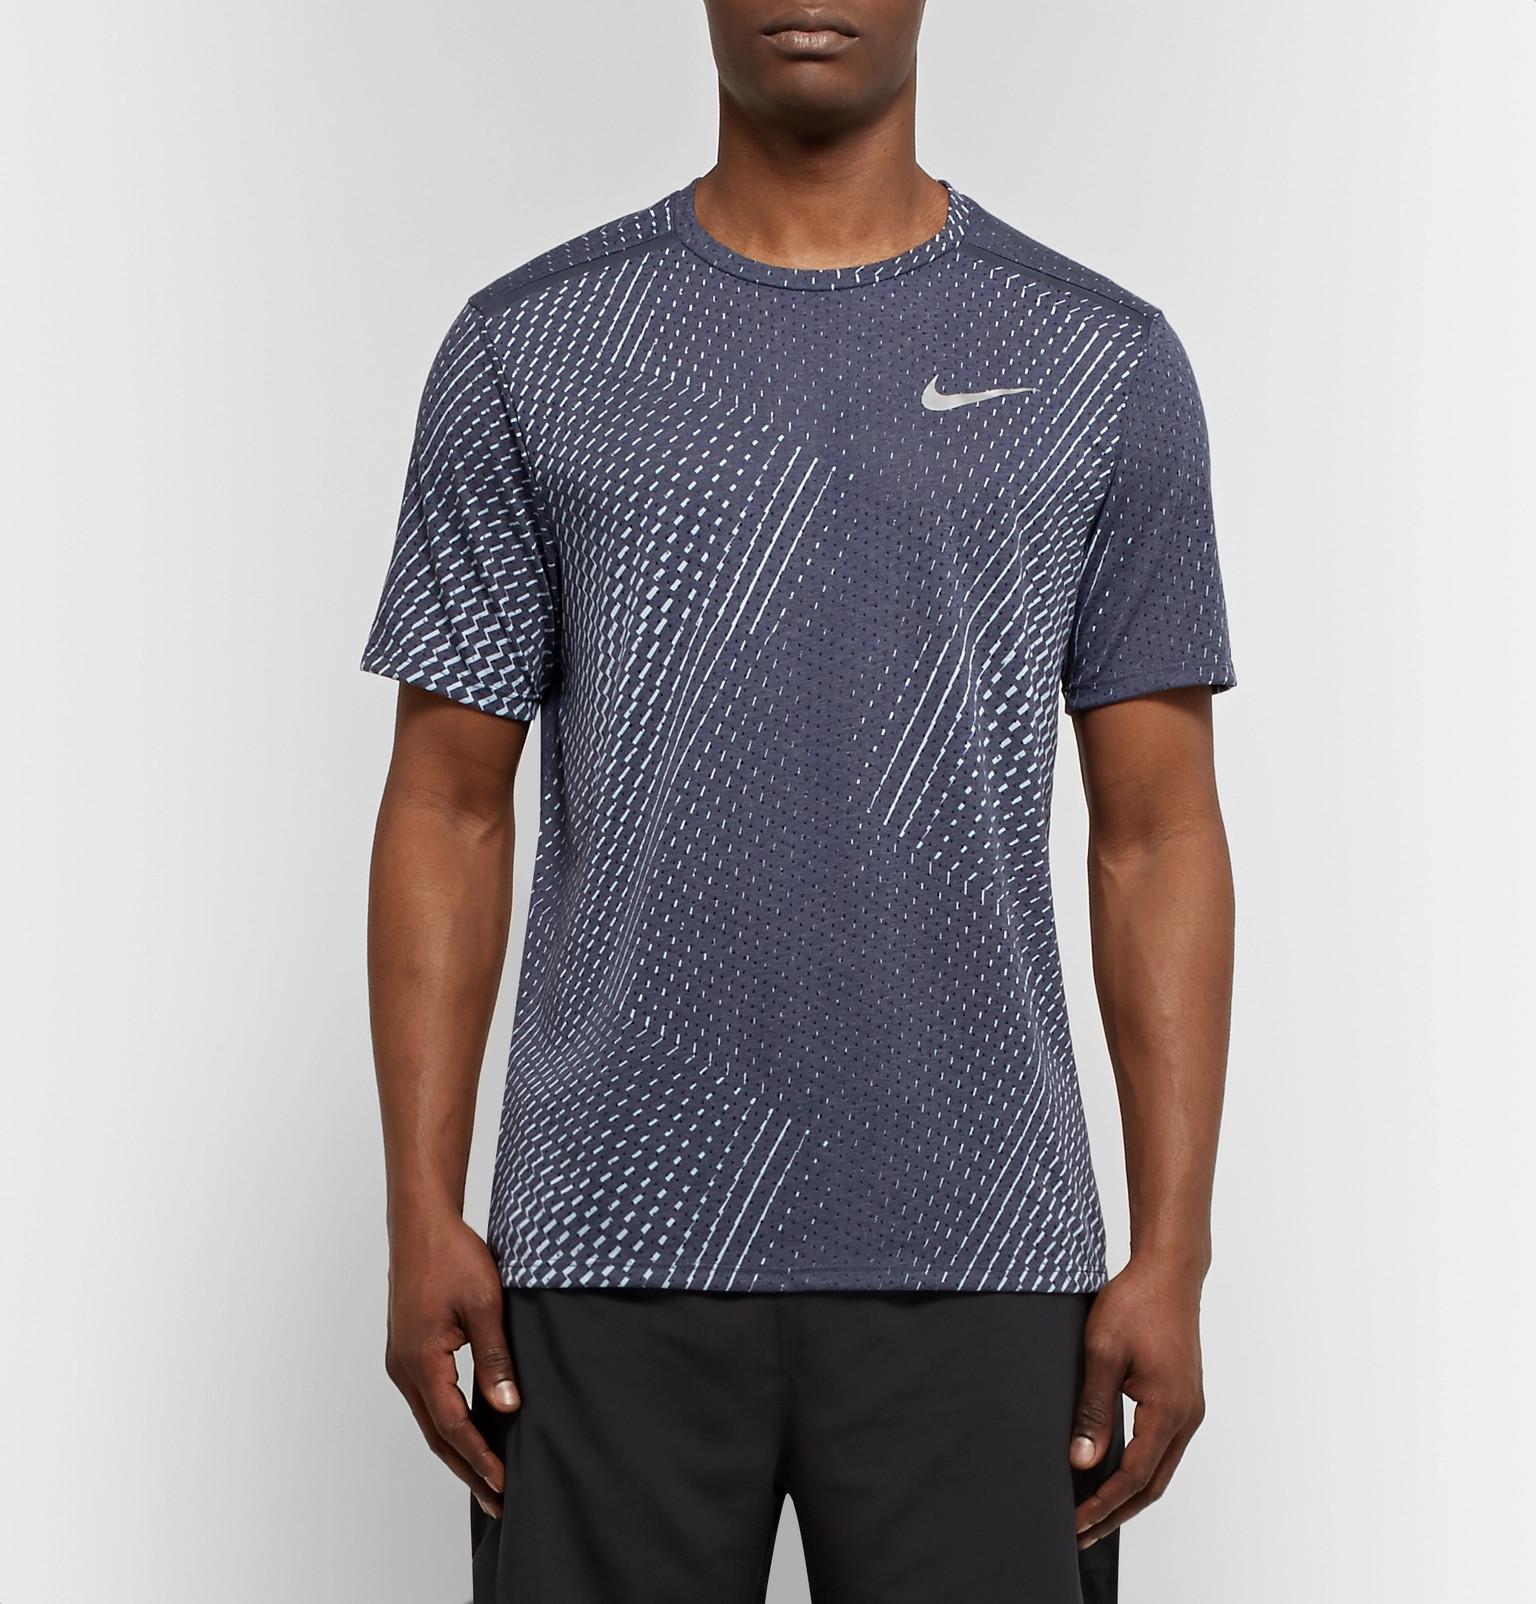 82bedaa509e7 Lyst - Nike Rise 365 Dri-fit Mesh T-shirt in Gray for Men